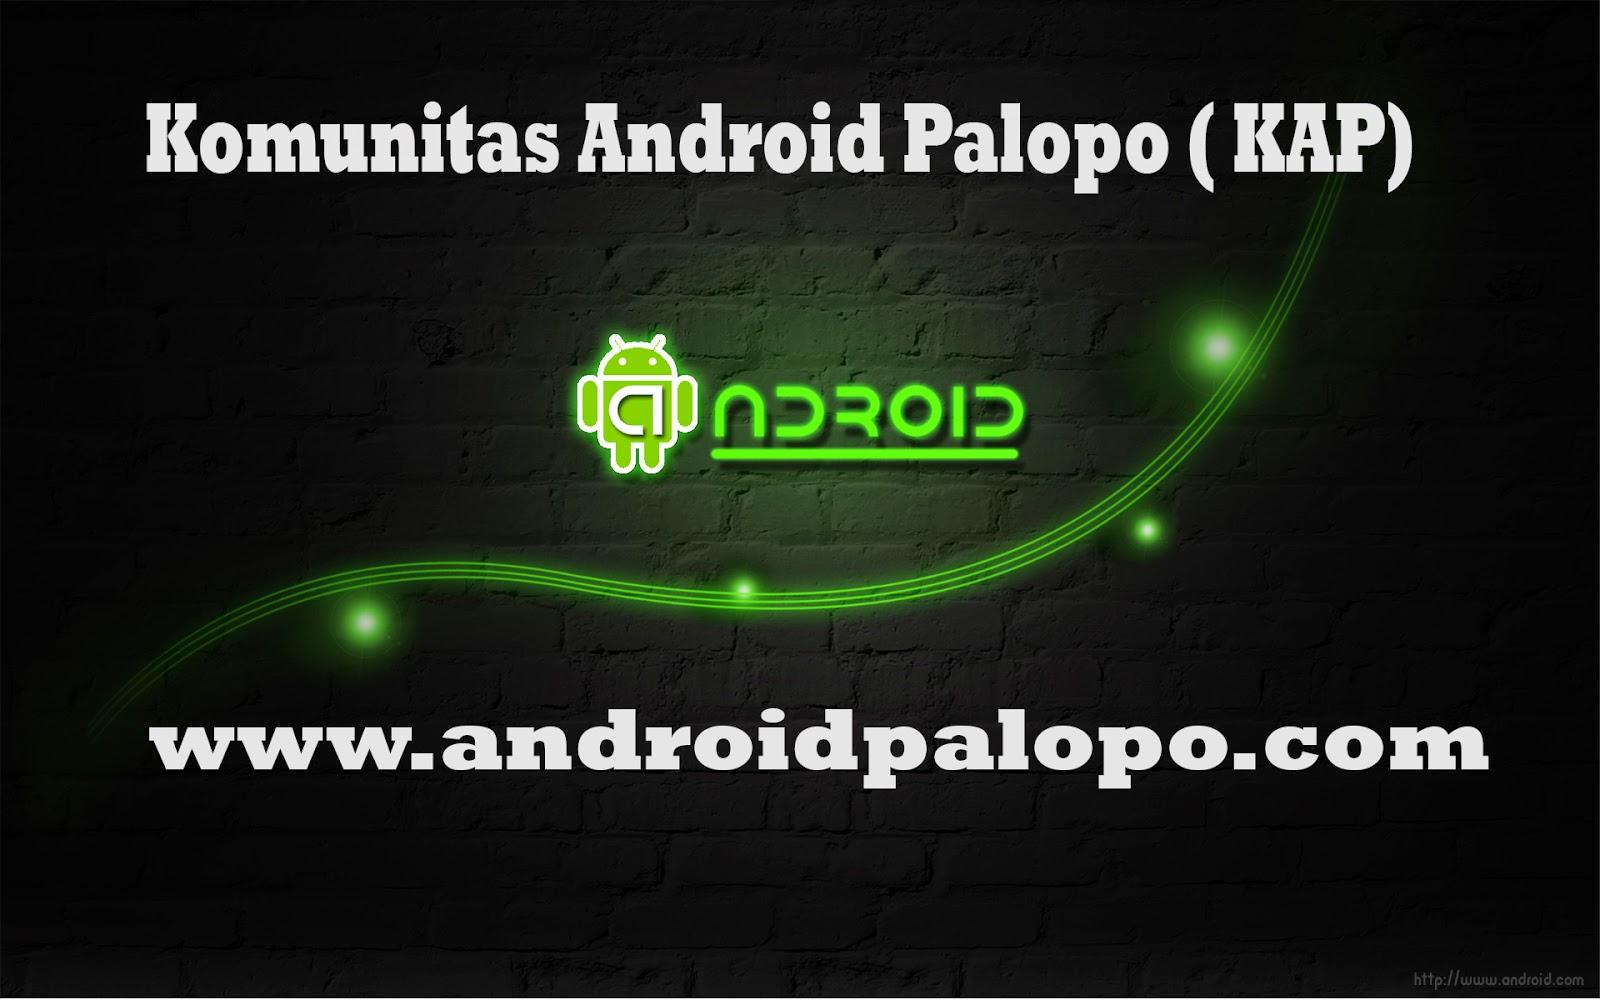 Komunitas Android Palopo